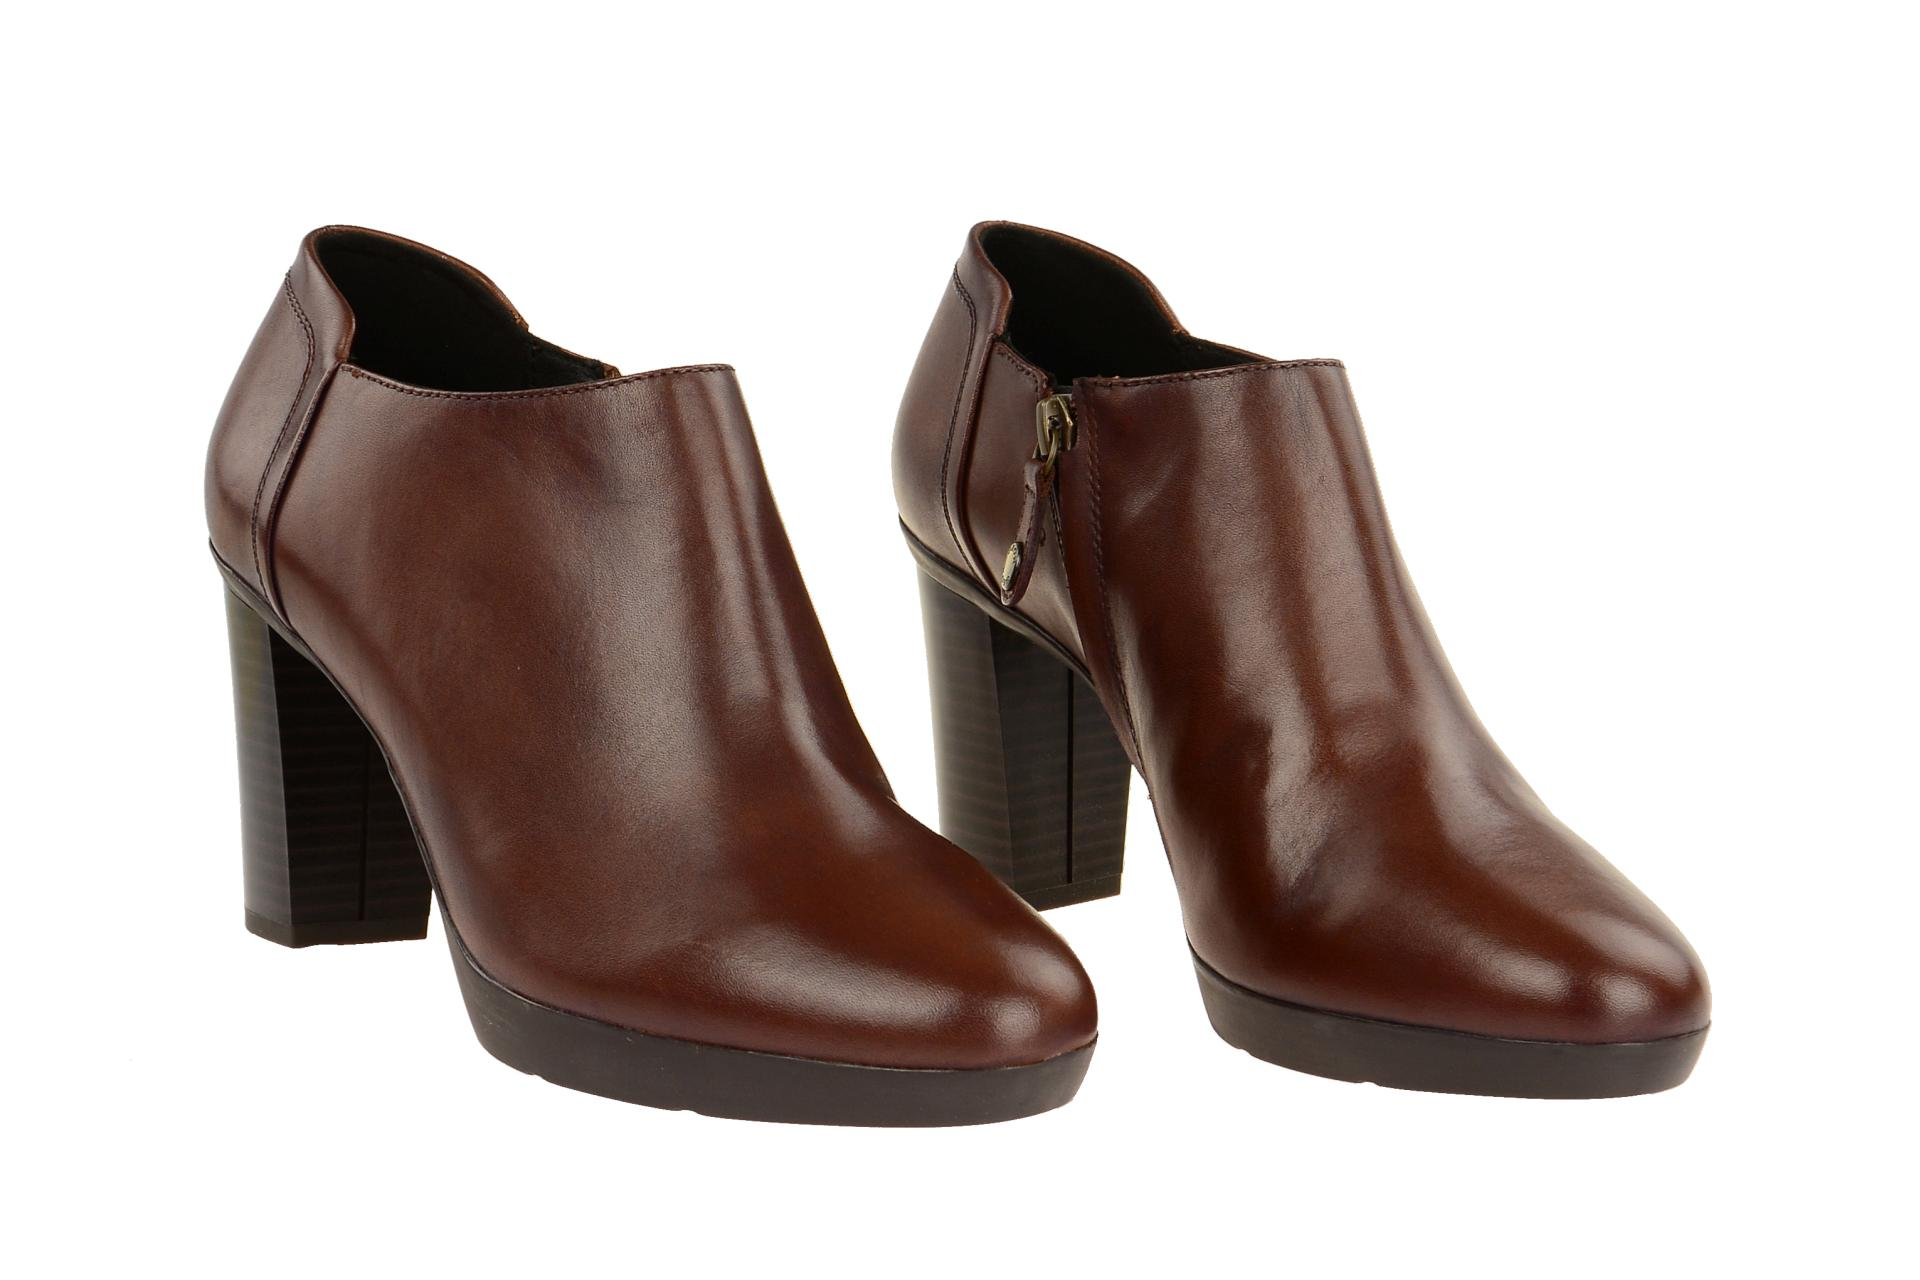 Stivaletti Braun Damen Stiefeletten Inspiration Geox Schuhe D746ac 00043 C0013Ebay O0wPkn8X